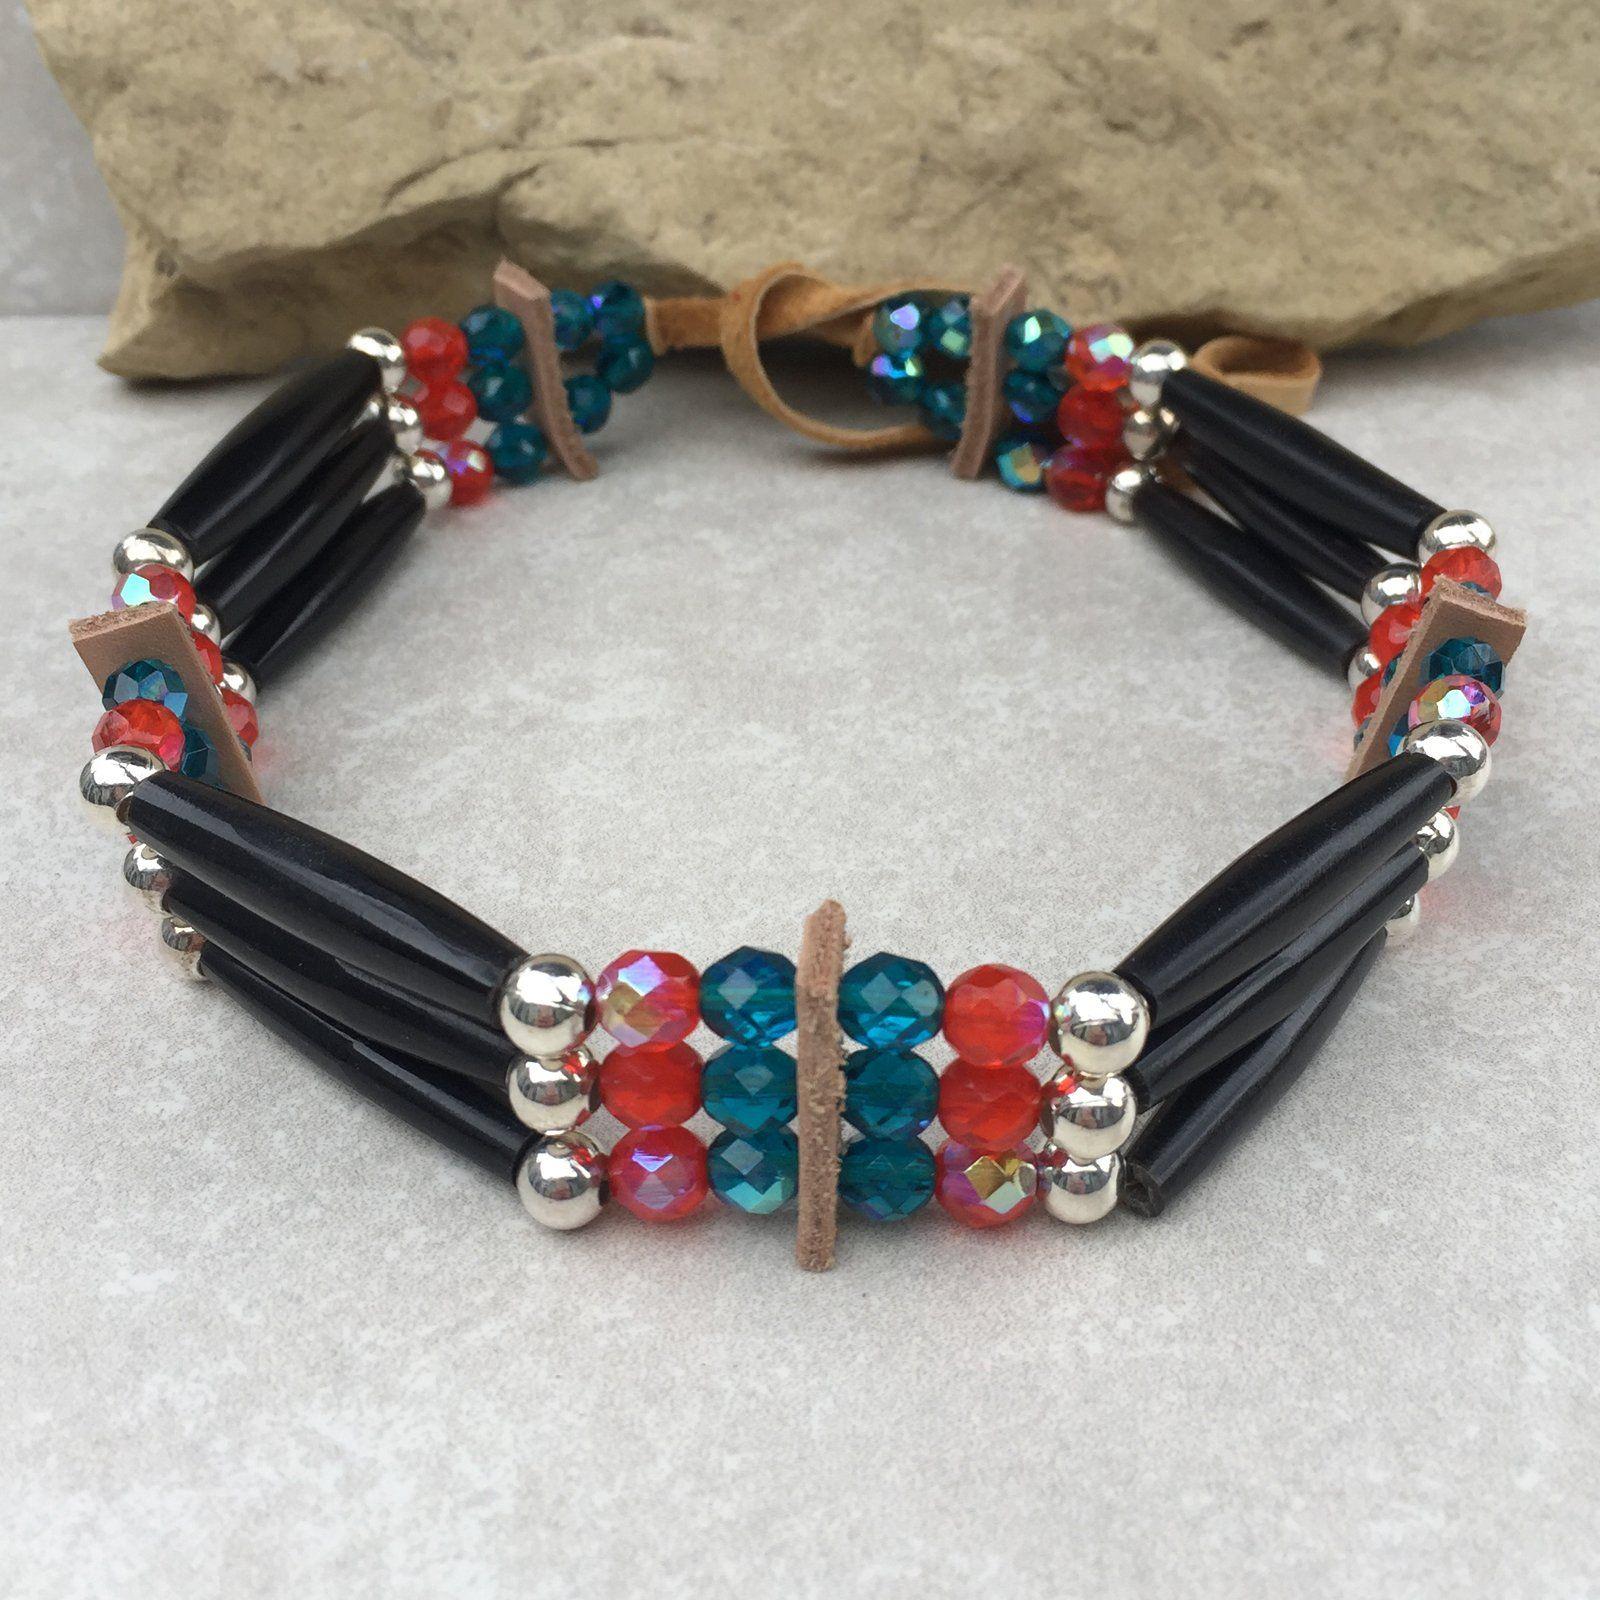 18+ Authentic handmade native american jewelry ideas